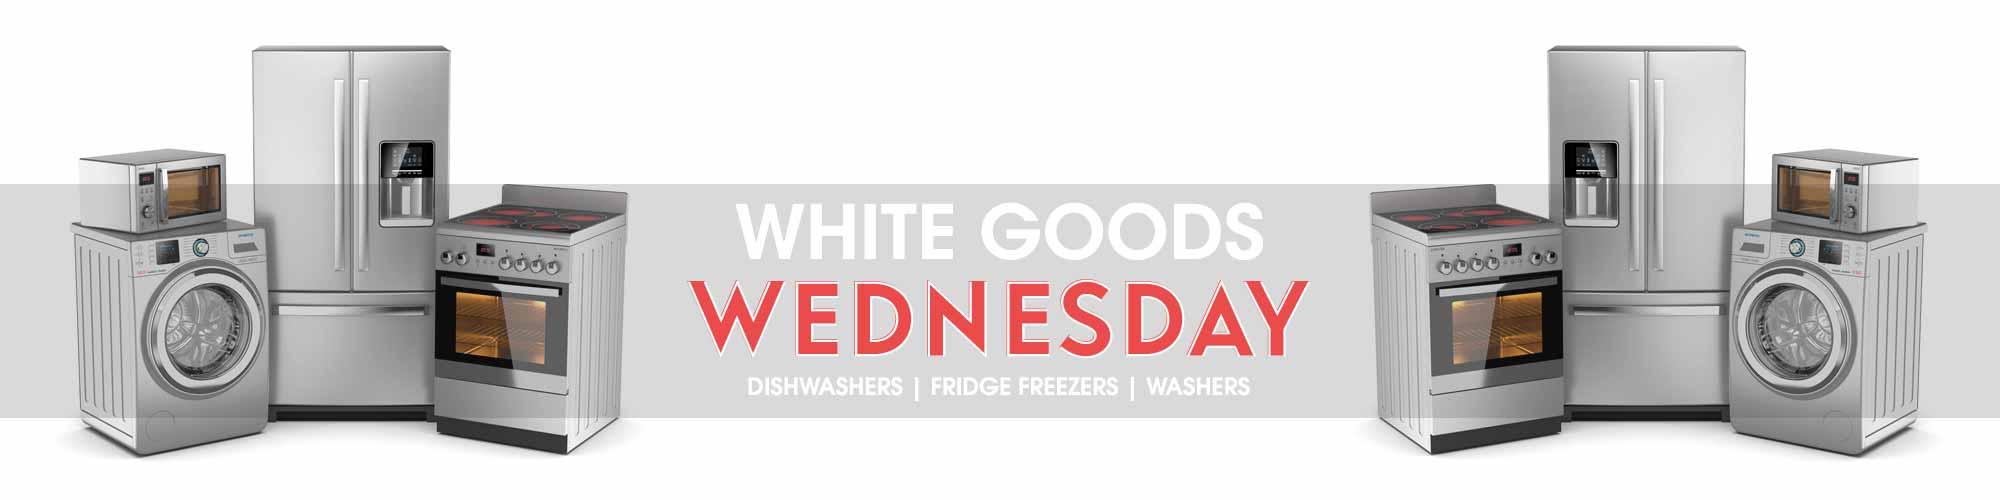 White Good Wednesday!